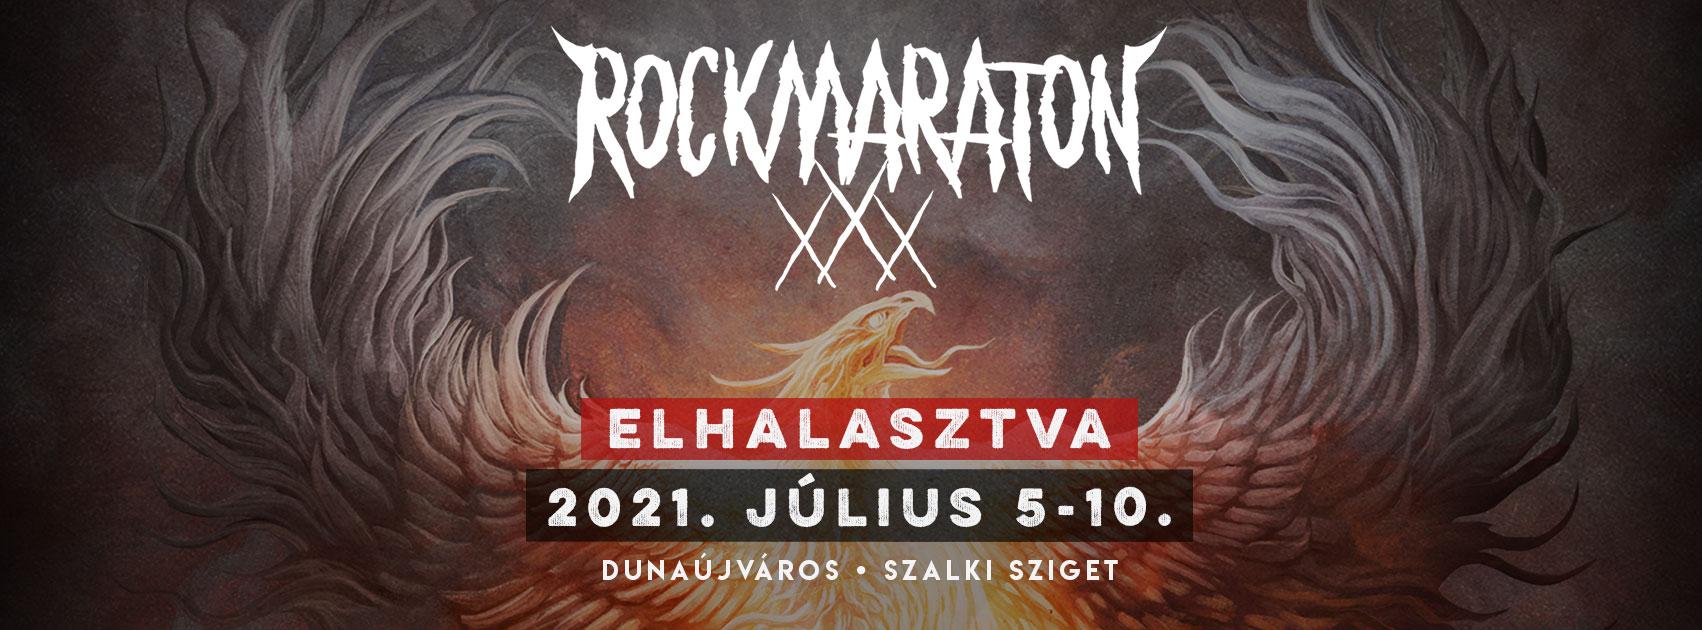 rockmaraton_2021_01.jpg